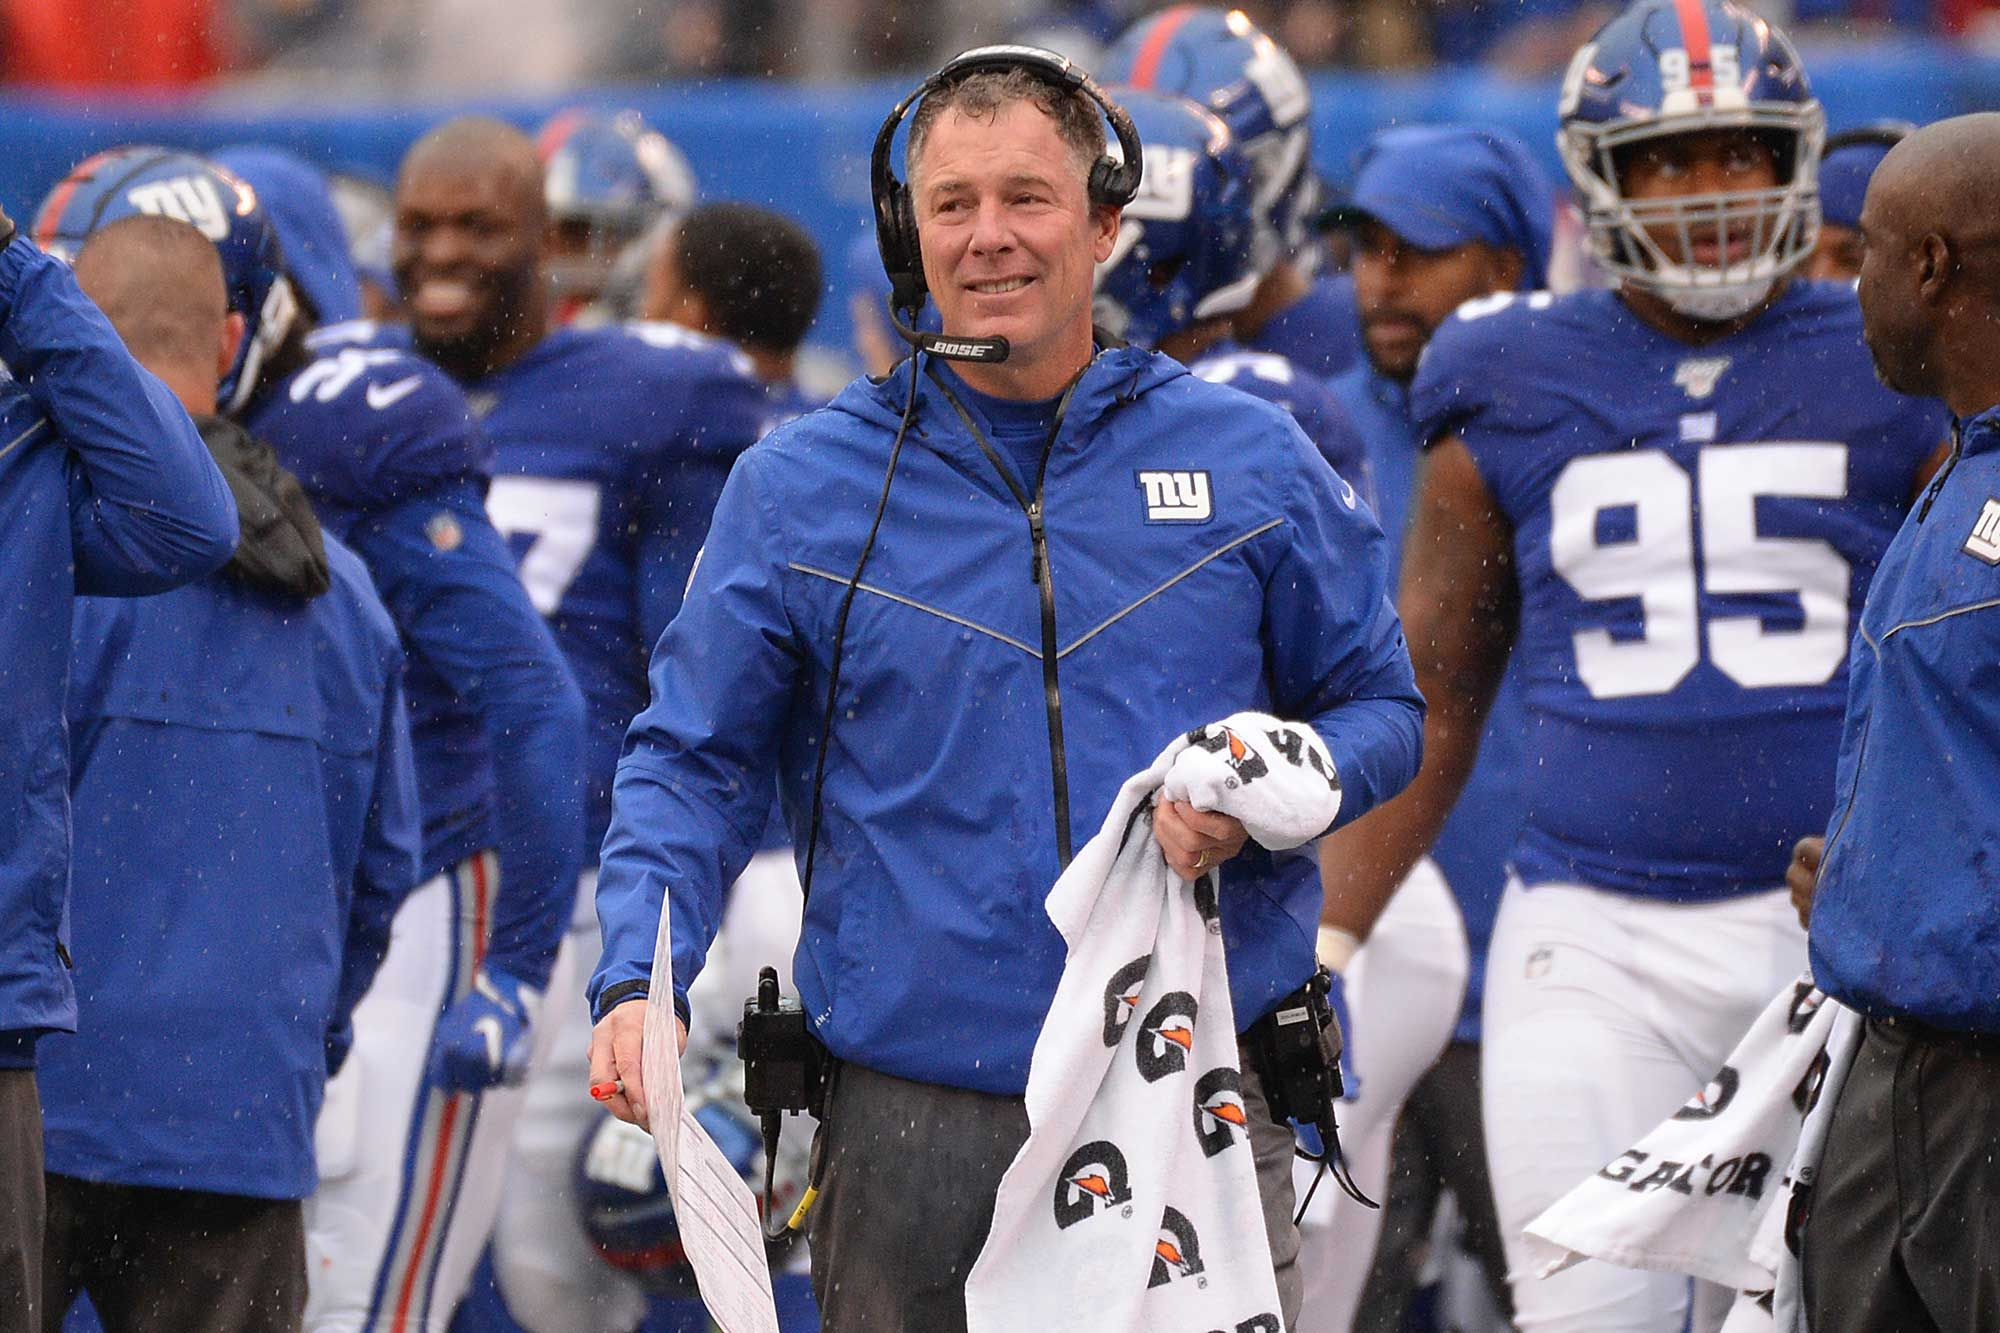 New York Giants head coach Pat Shurmur